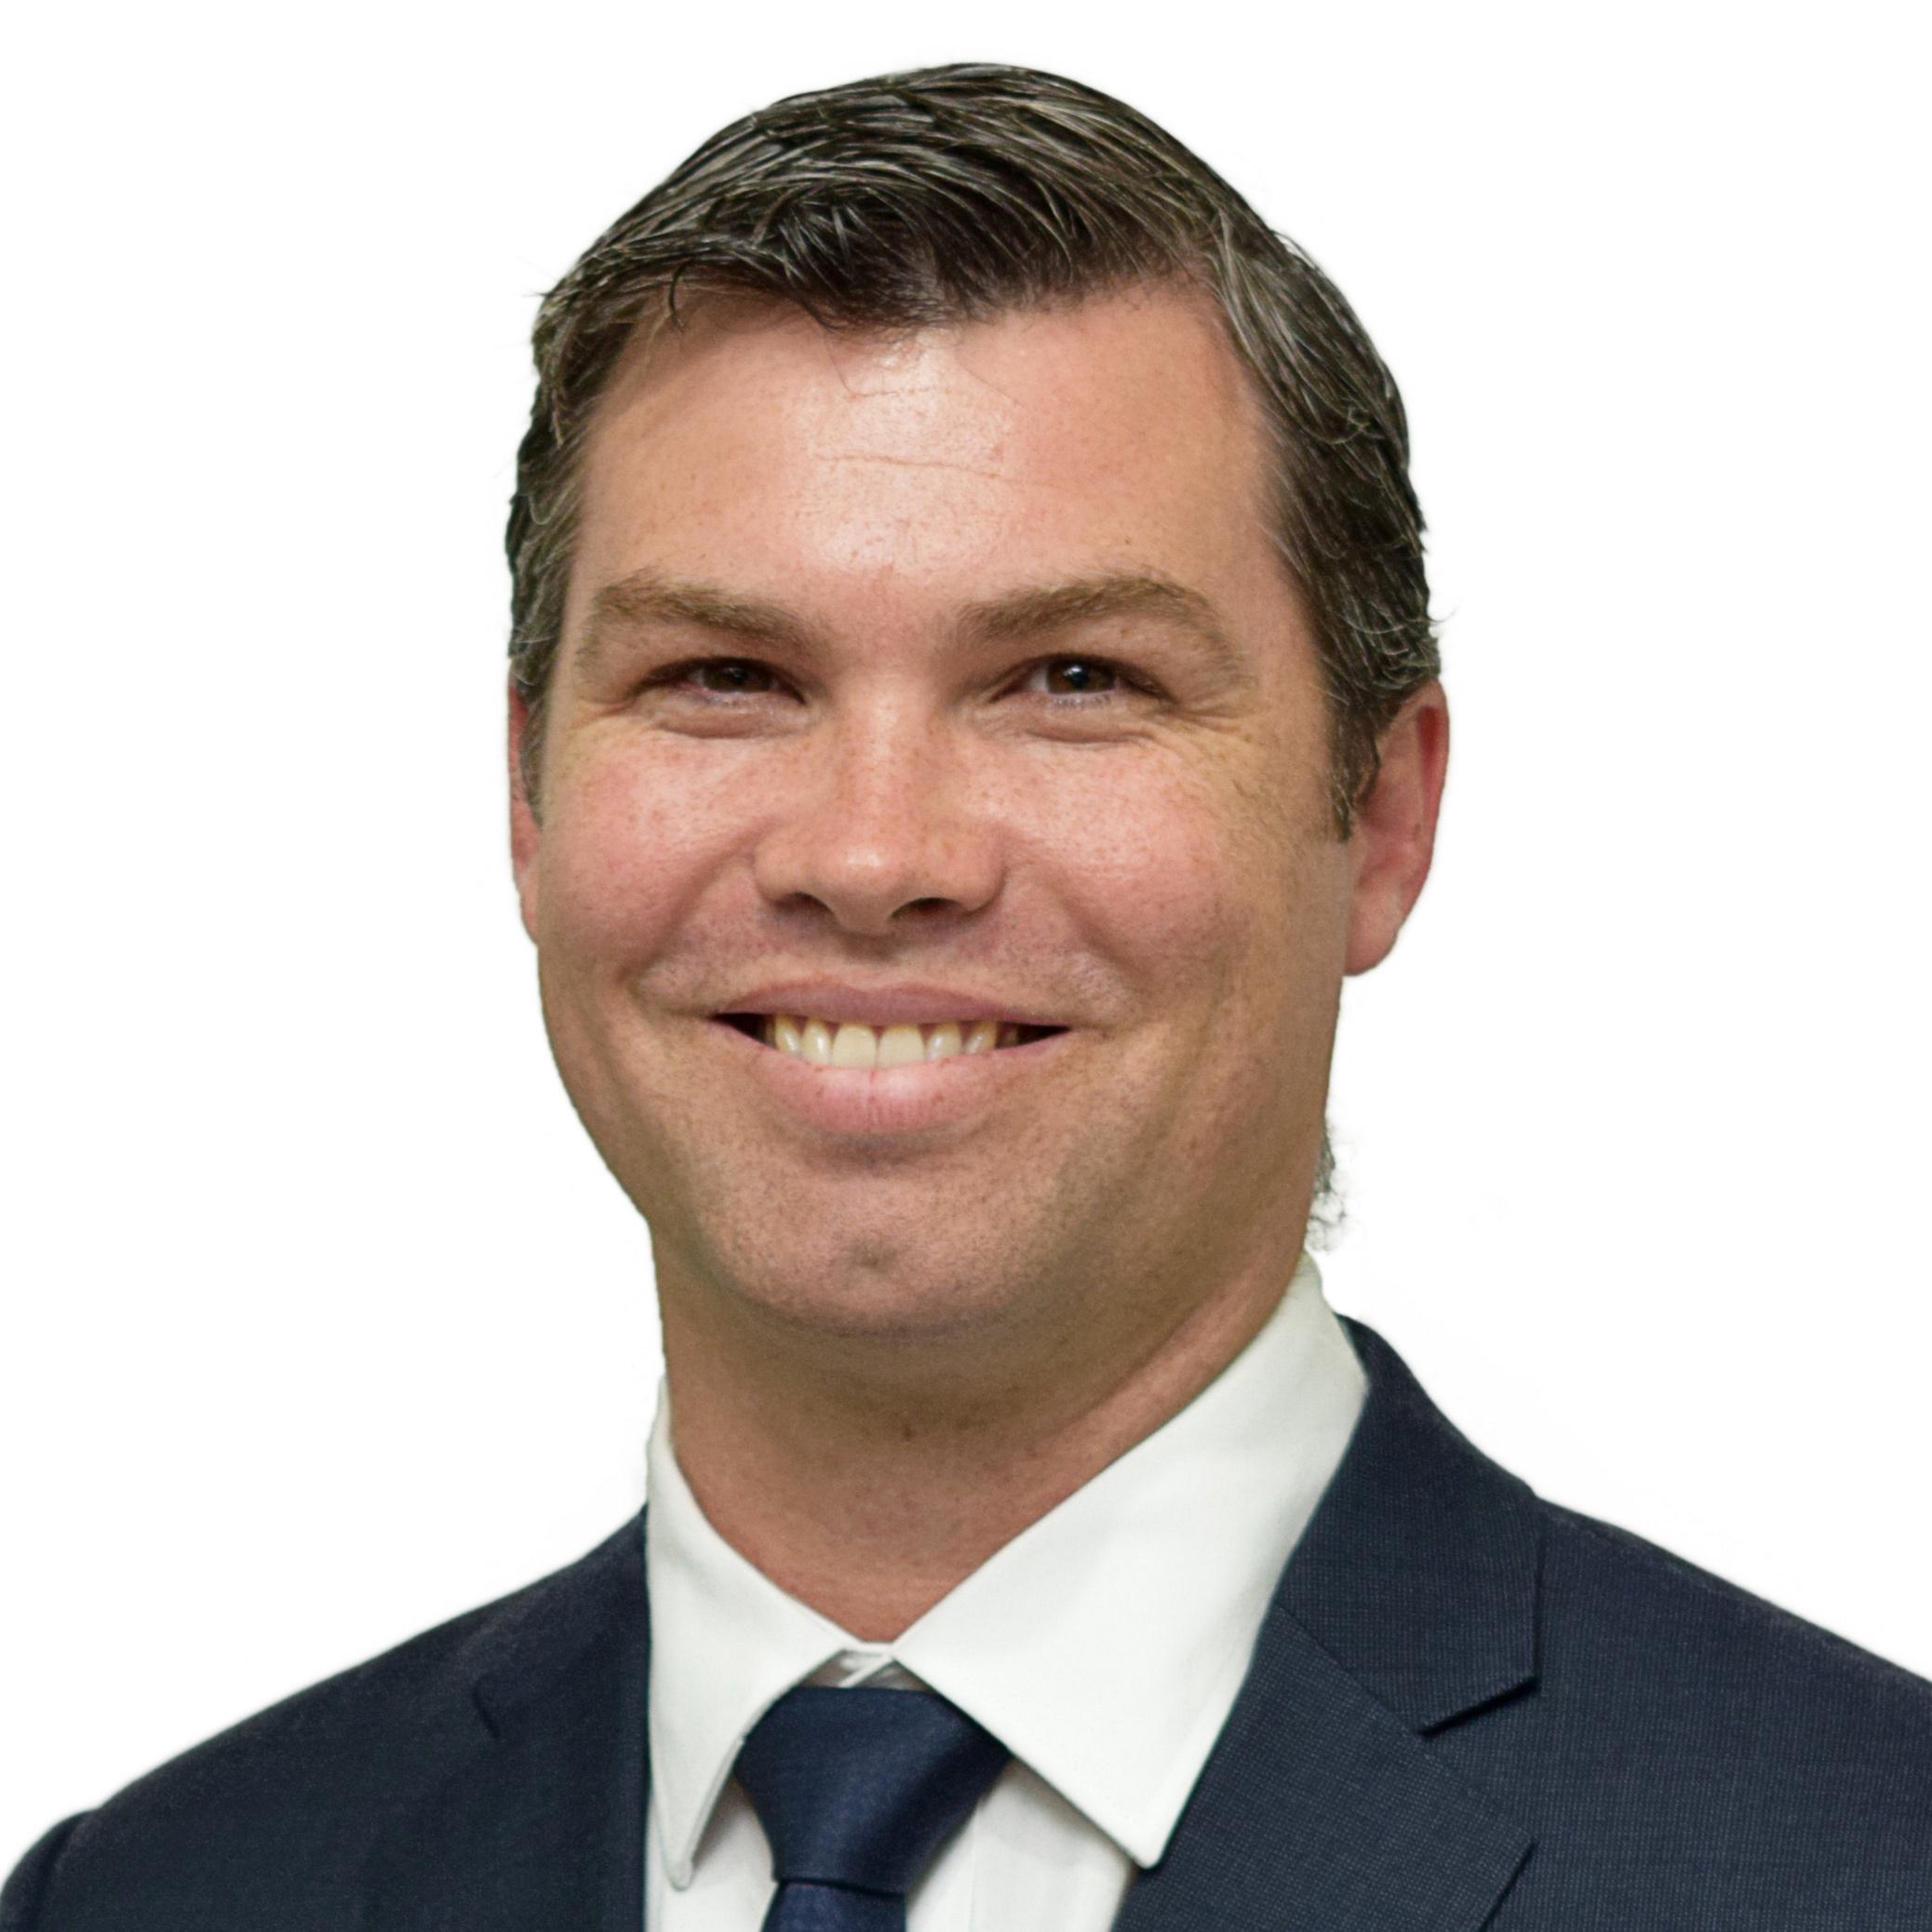 John Ferguson-EIU-The-Economist-intelligence-unit-eu-japan-forrum-trade-investment.JPG